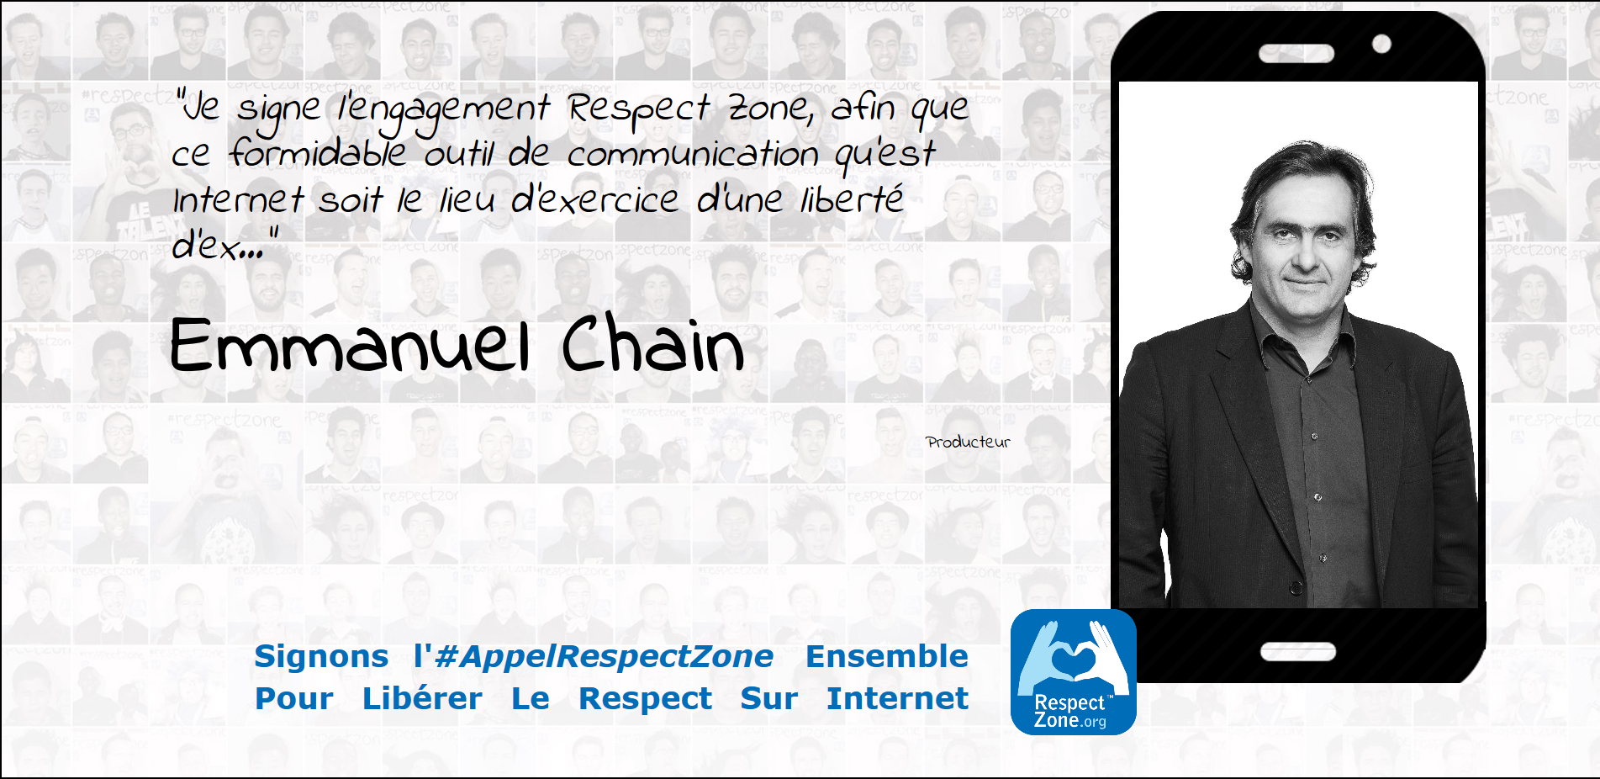 Emmanuel Chain